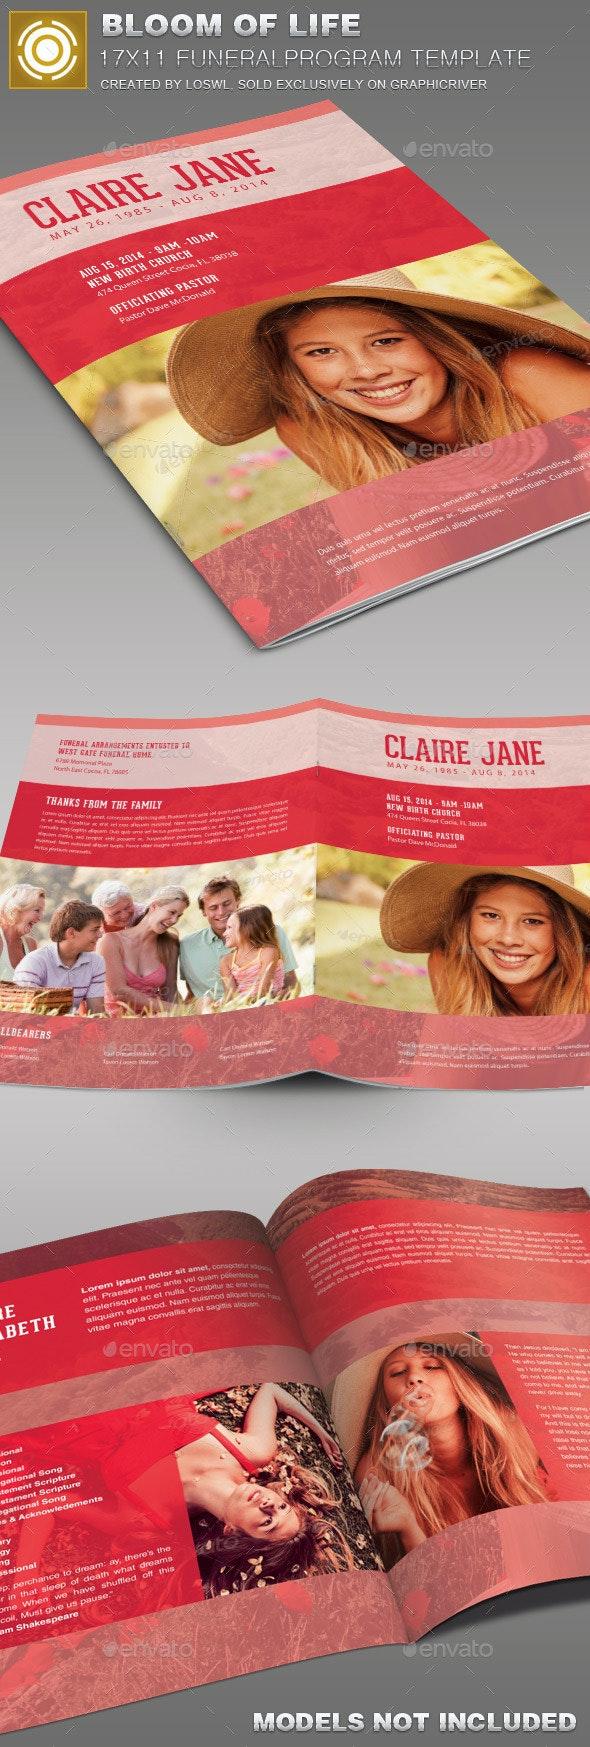 Bloom of Life Funeral Program Template 007 - Informational Brochures